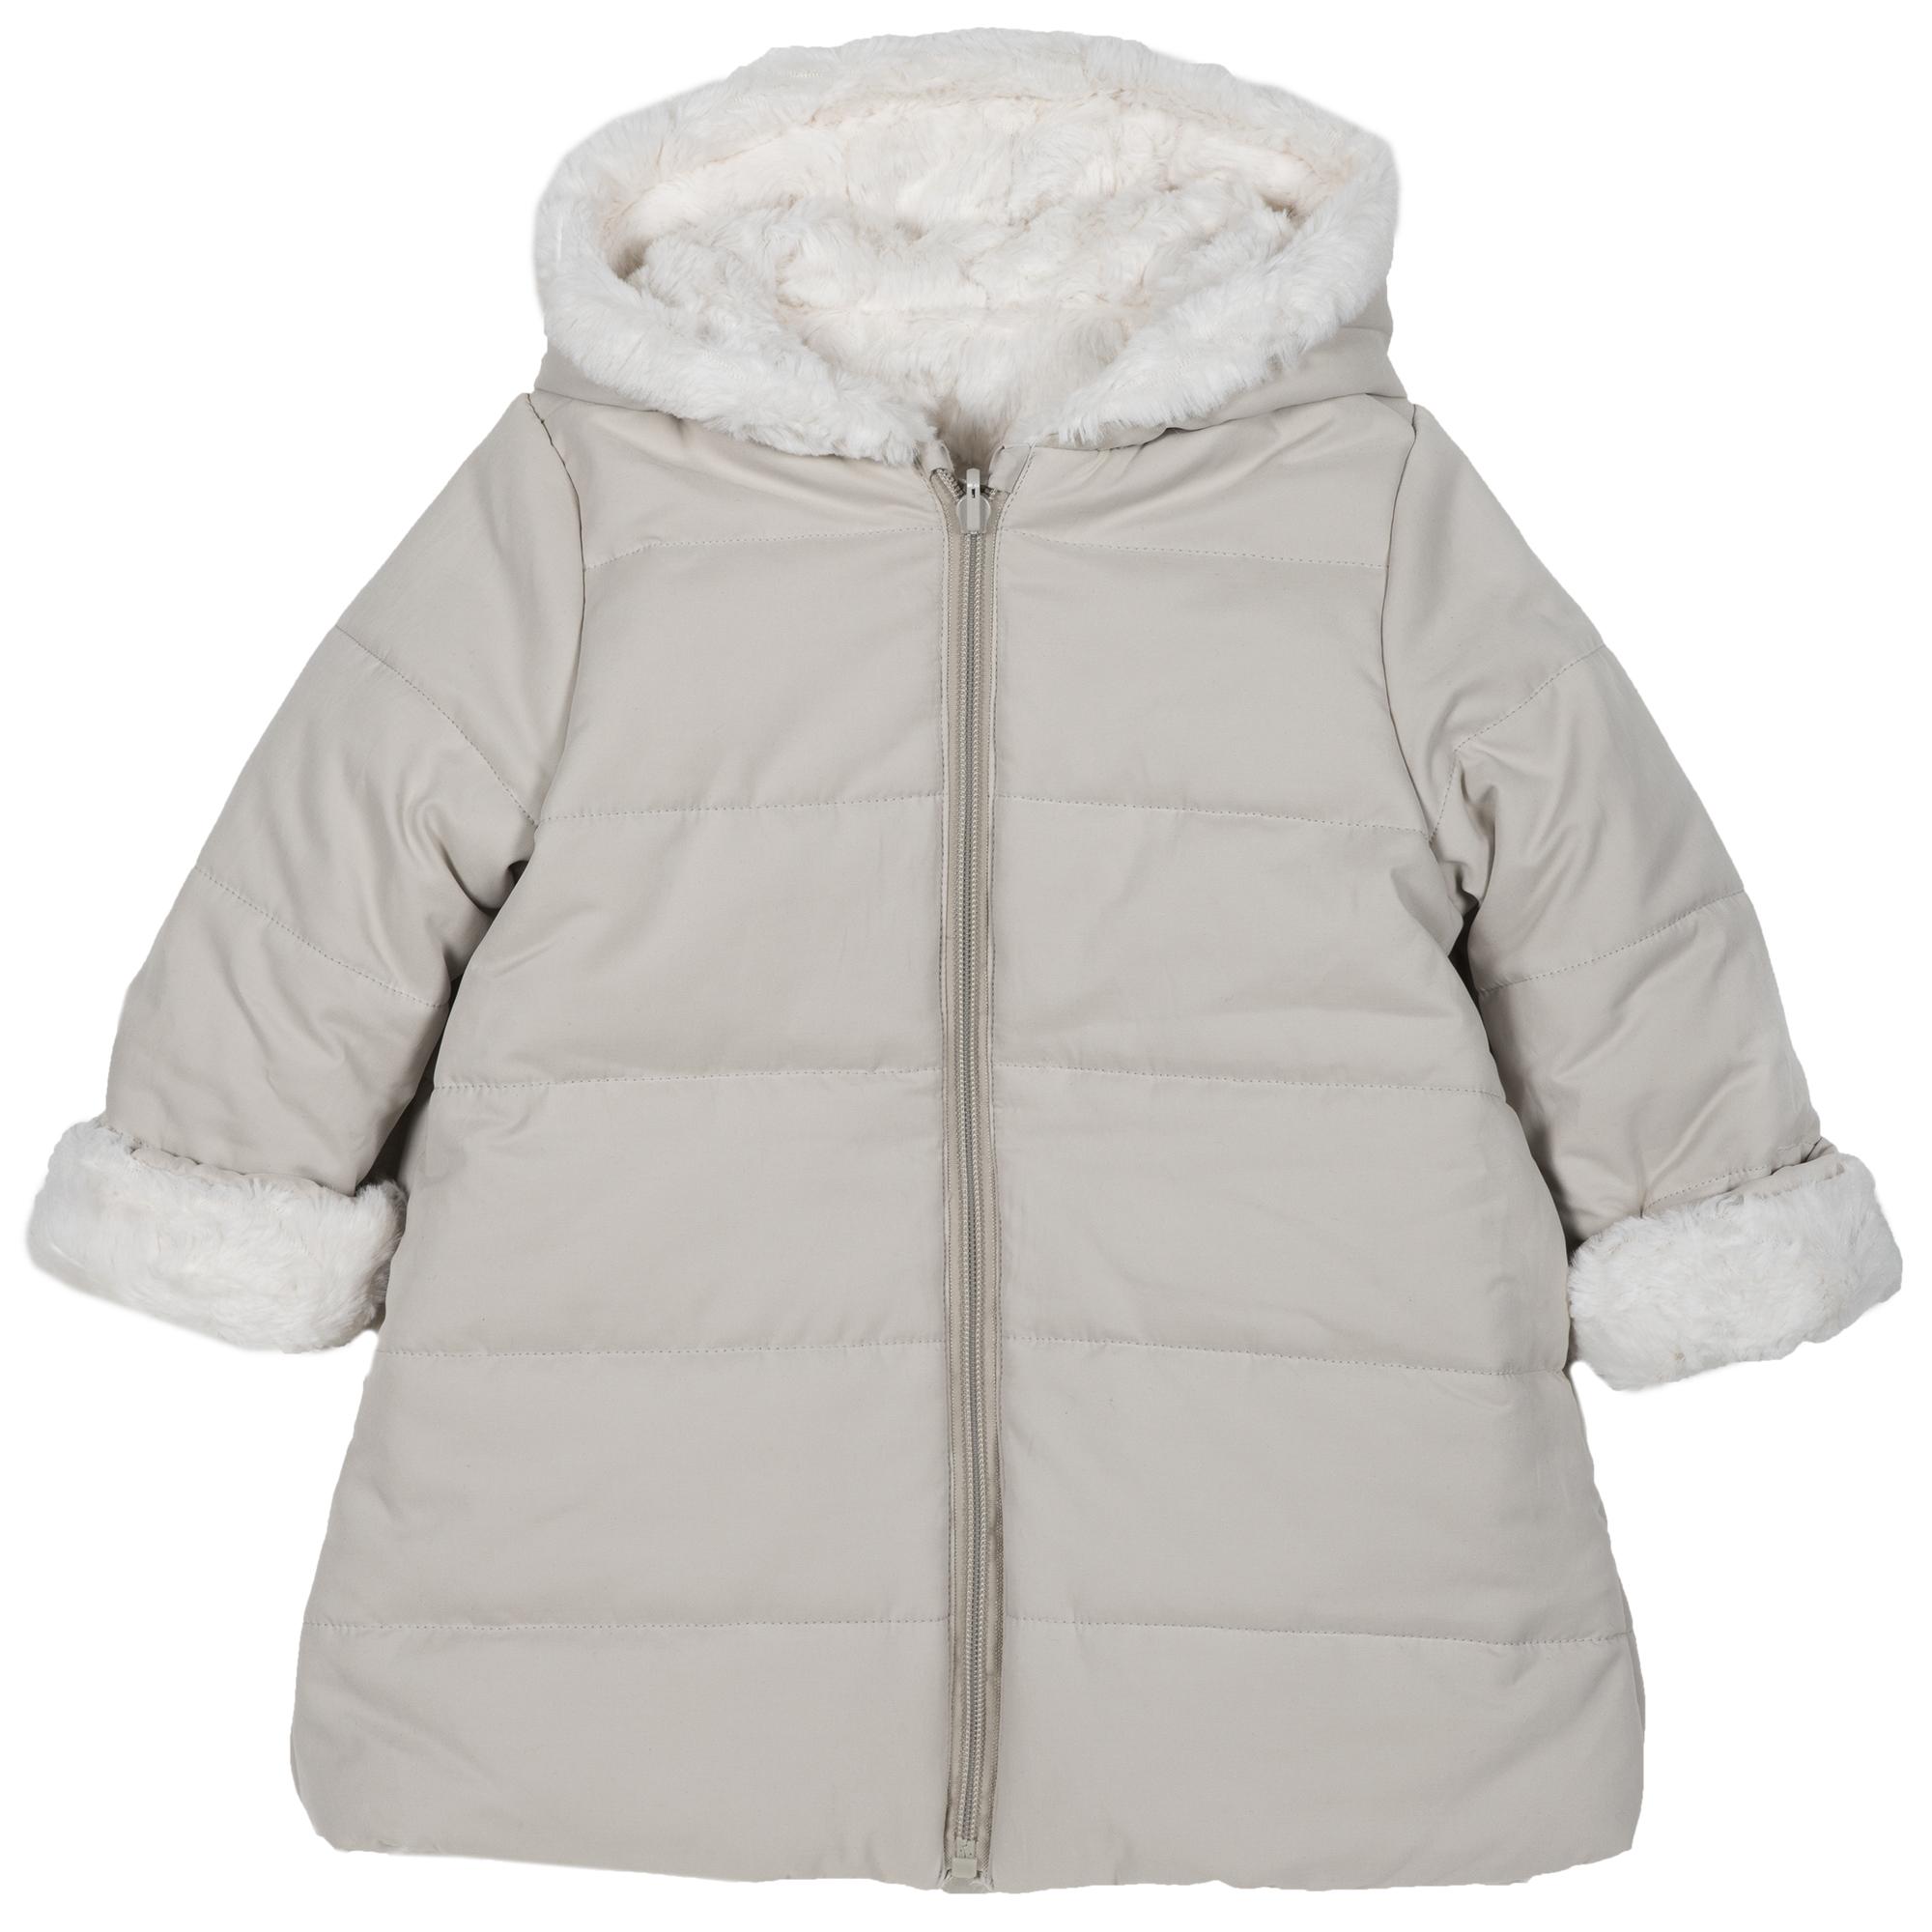 Jacheta copii Chicco, bej